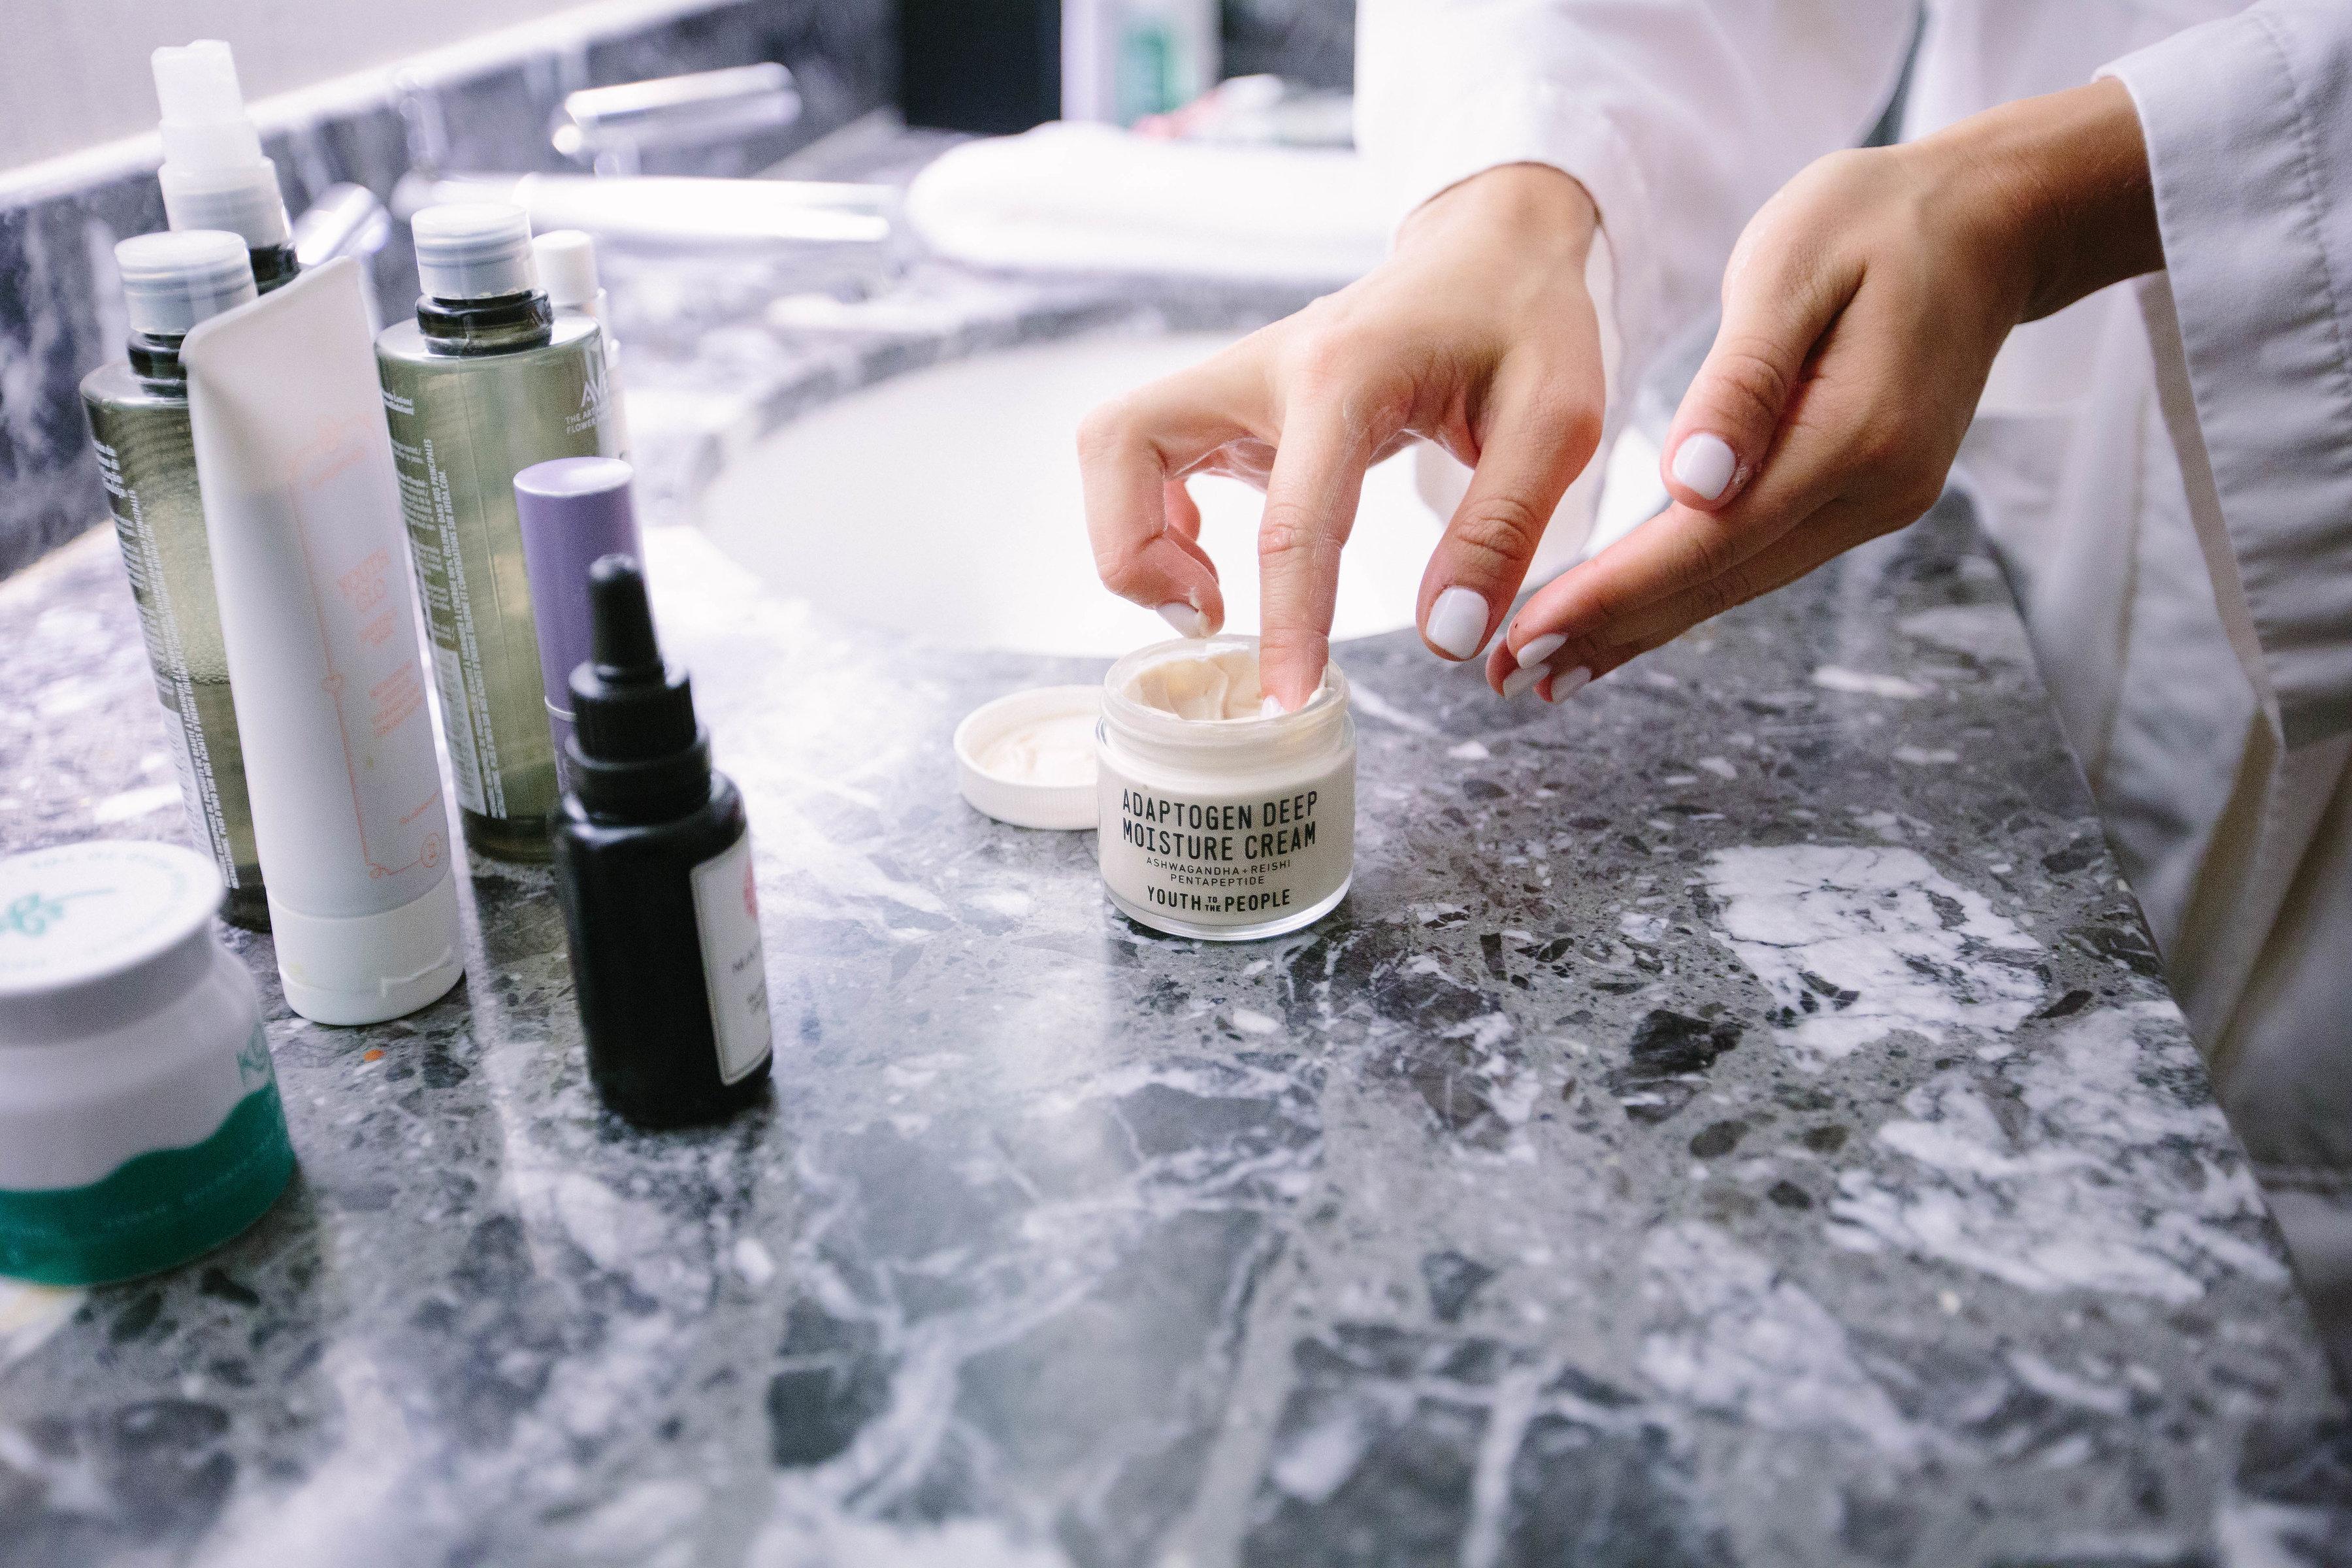 Brightening Facial Scrub by acure organics #8